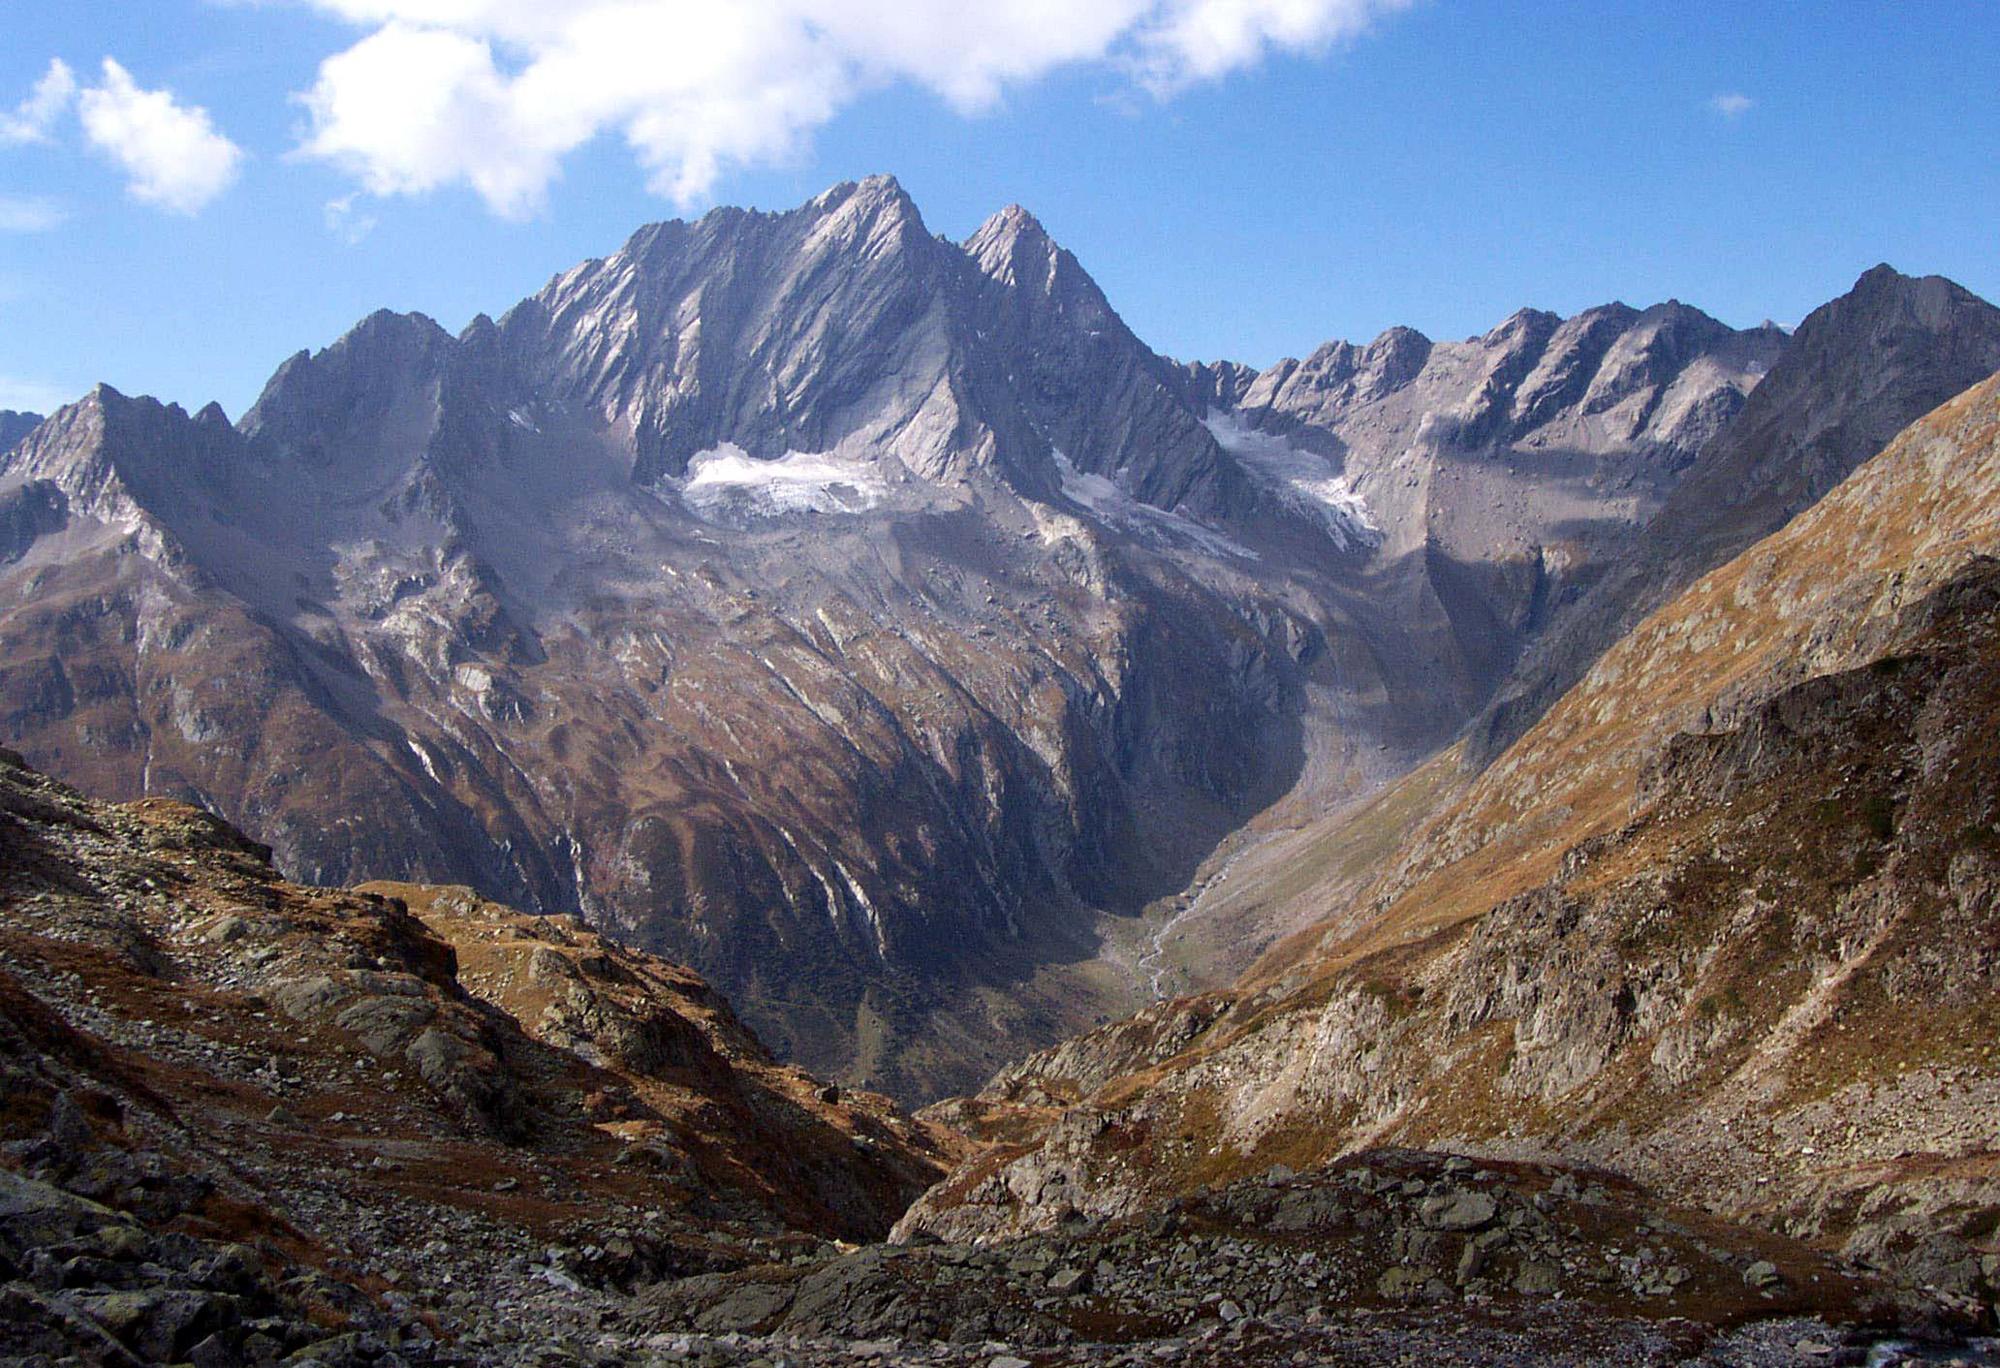 Hasil gambar untuk Graubünden